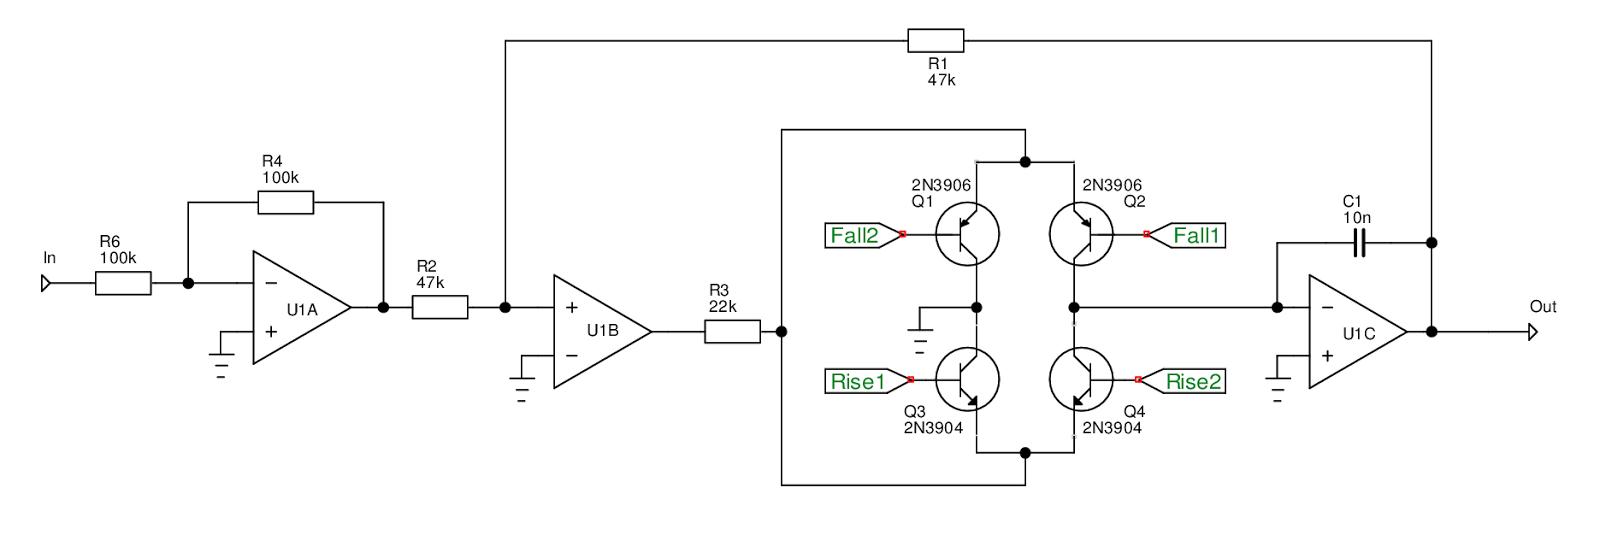 kassutronics slope generator rh kassu2000 blogspot com Adjustable Voltage Regulator Circuit LM7805 Voltage Regulator Circuit